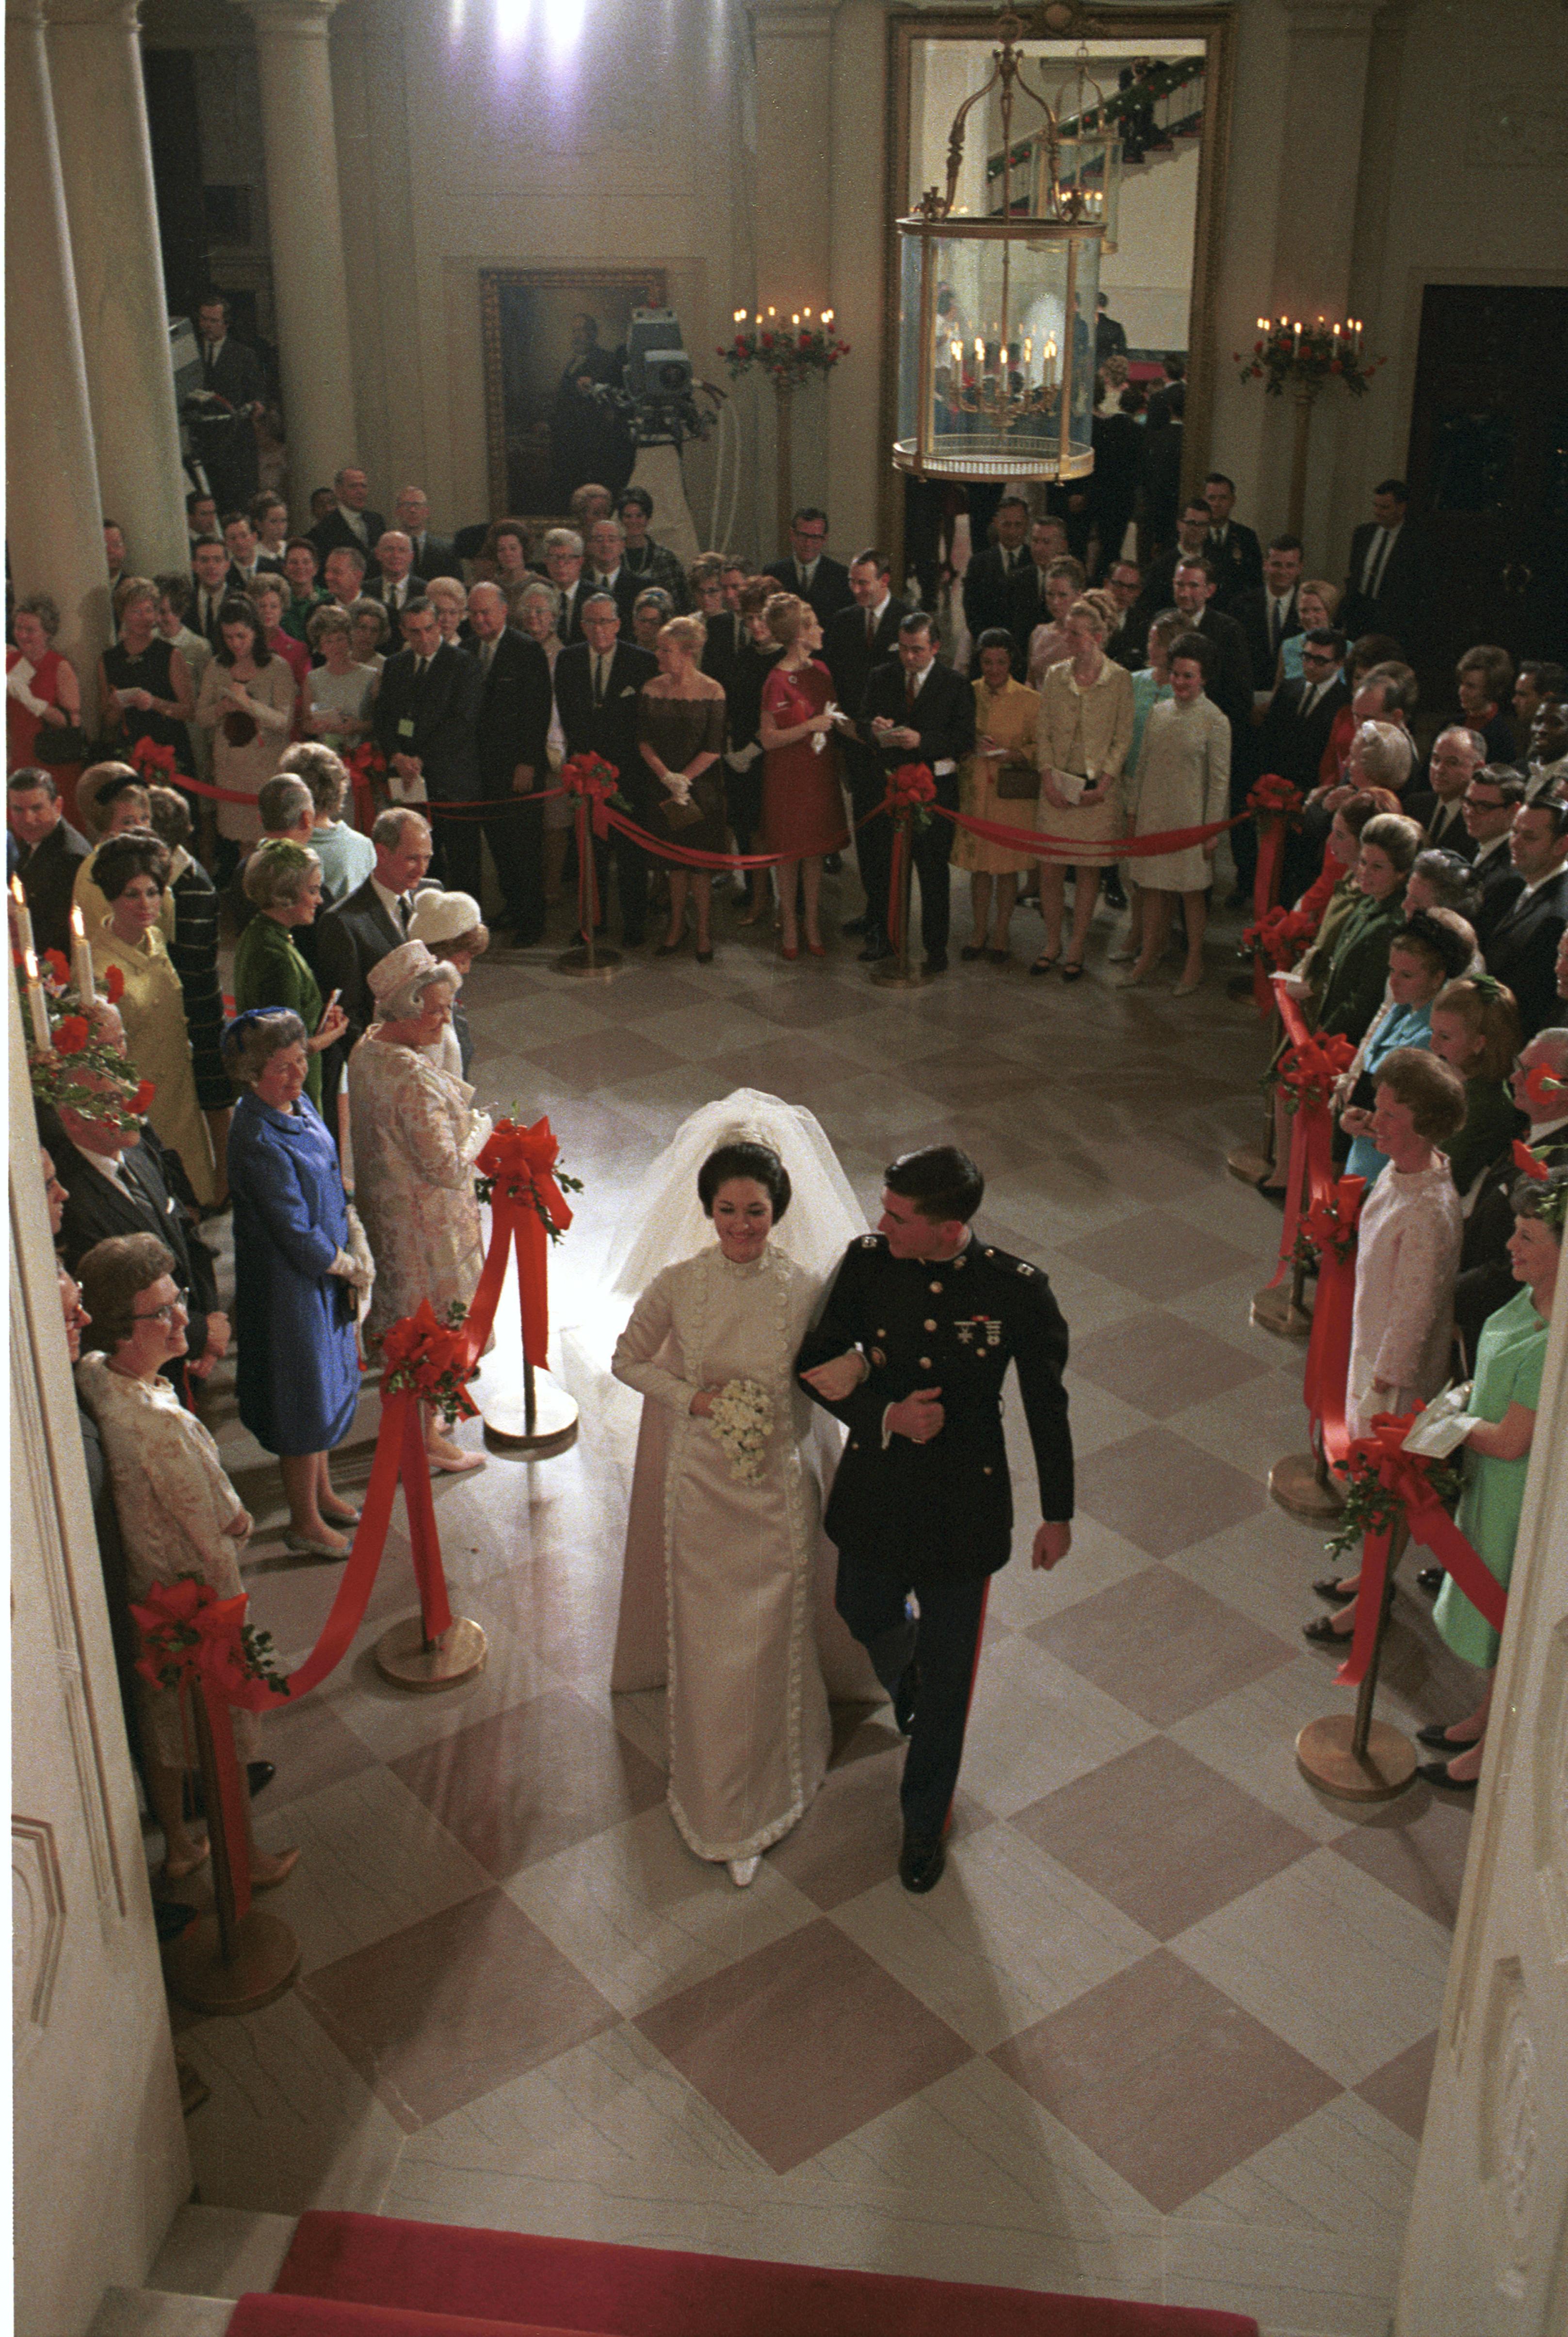 Lynda Bird Johnson andCharles Spittal Robb wedding